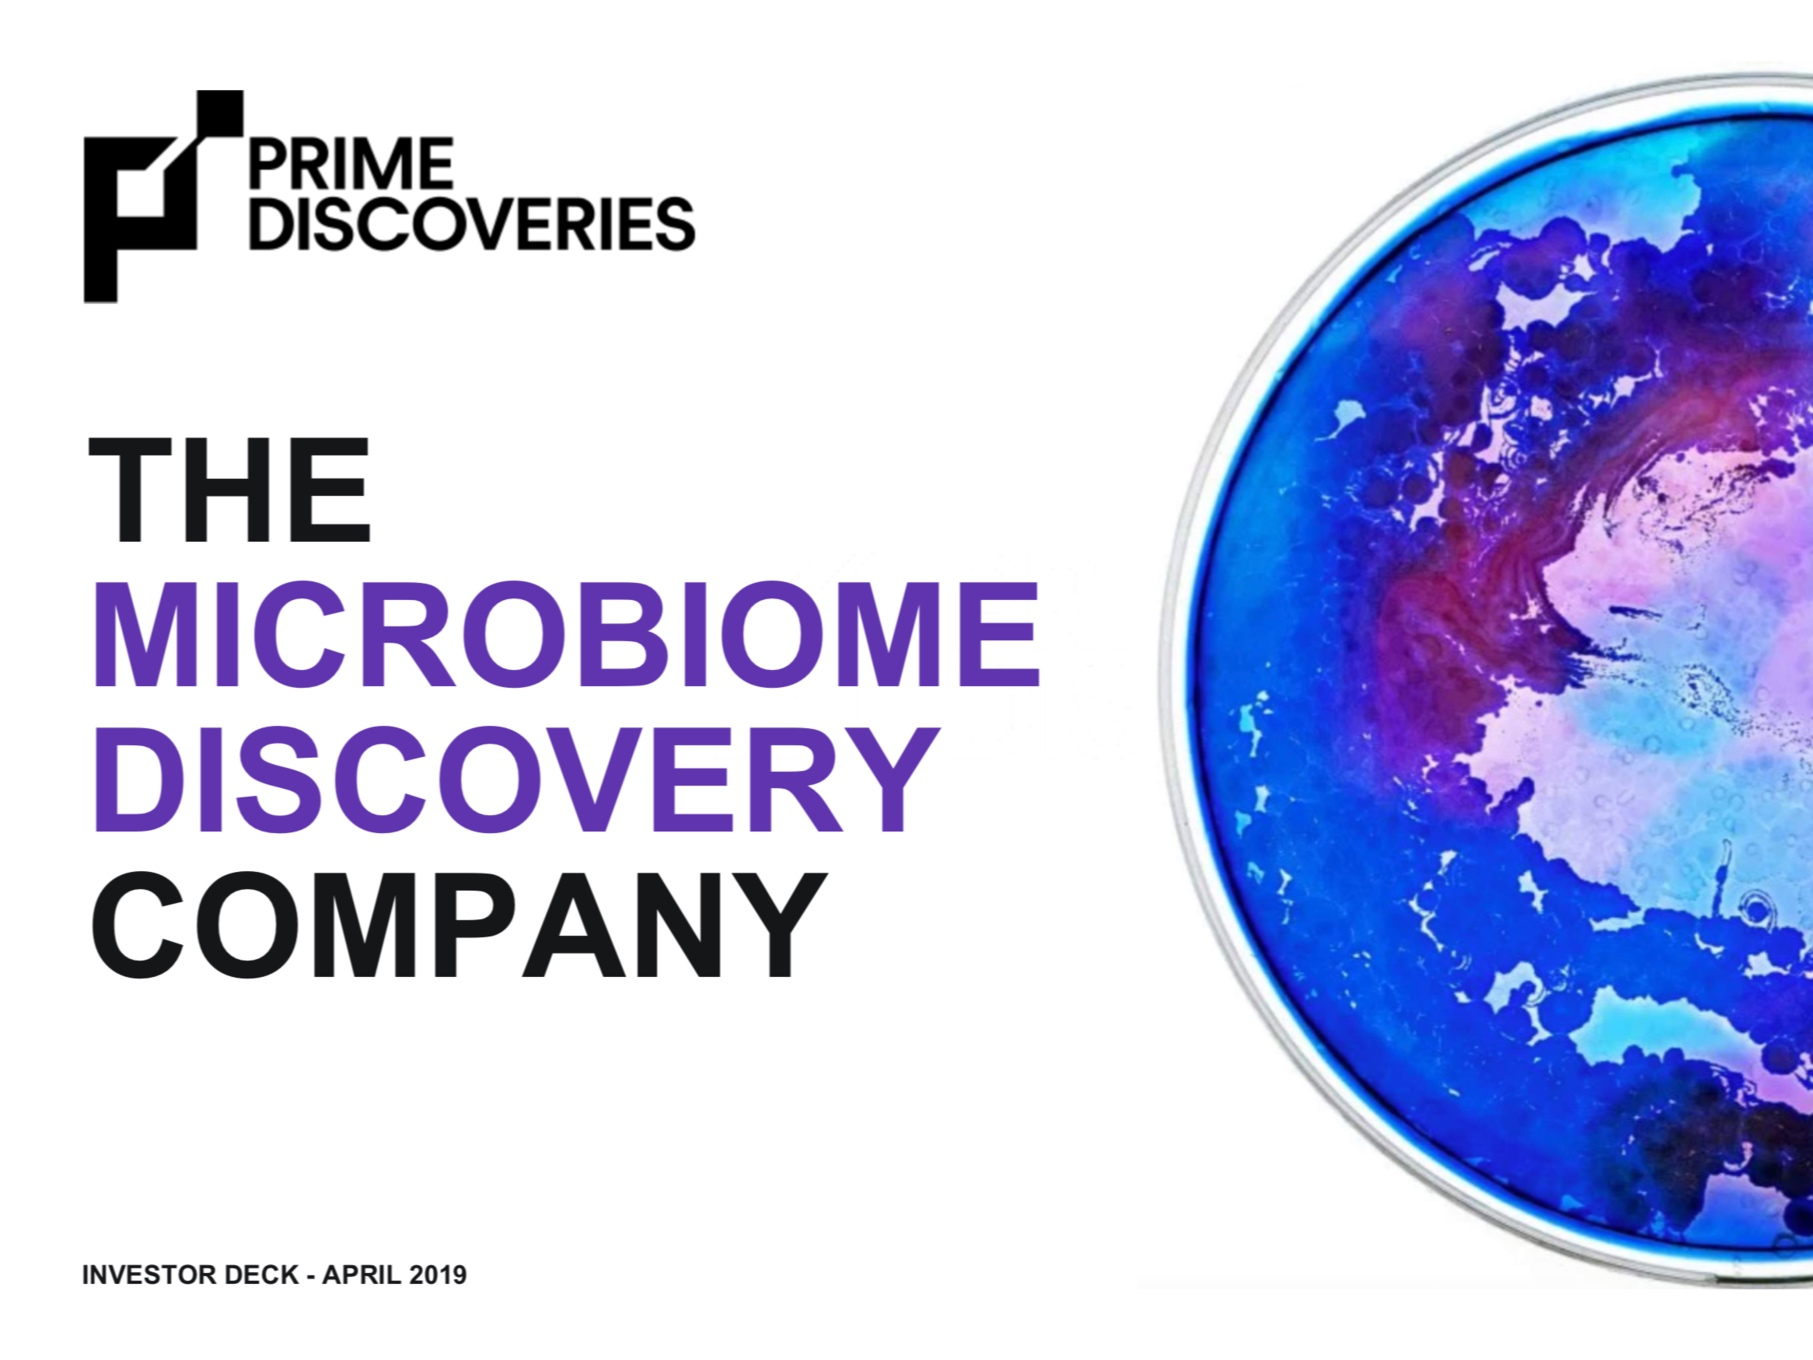 Prime Discoveries Deck -